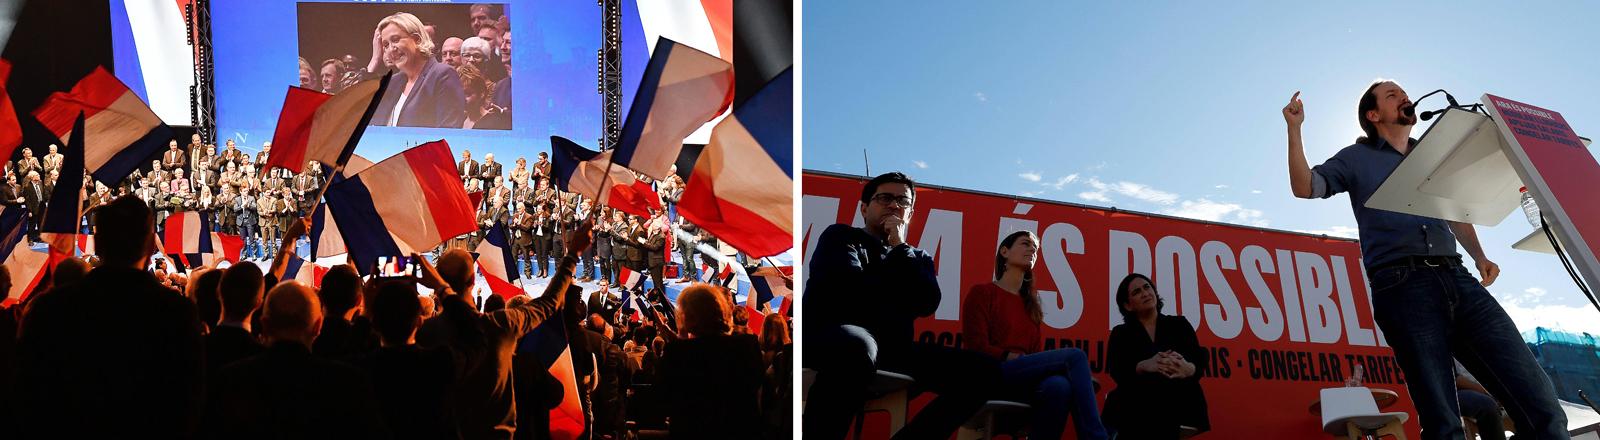 Collage: Links Versammlung Front National, rechts Versammlung Podemos